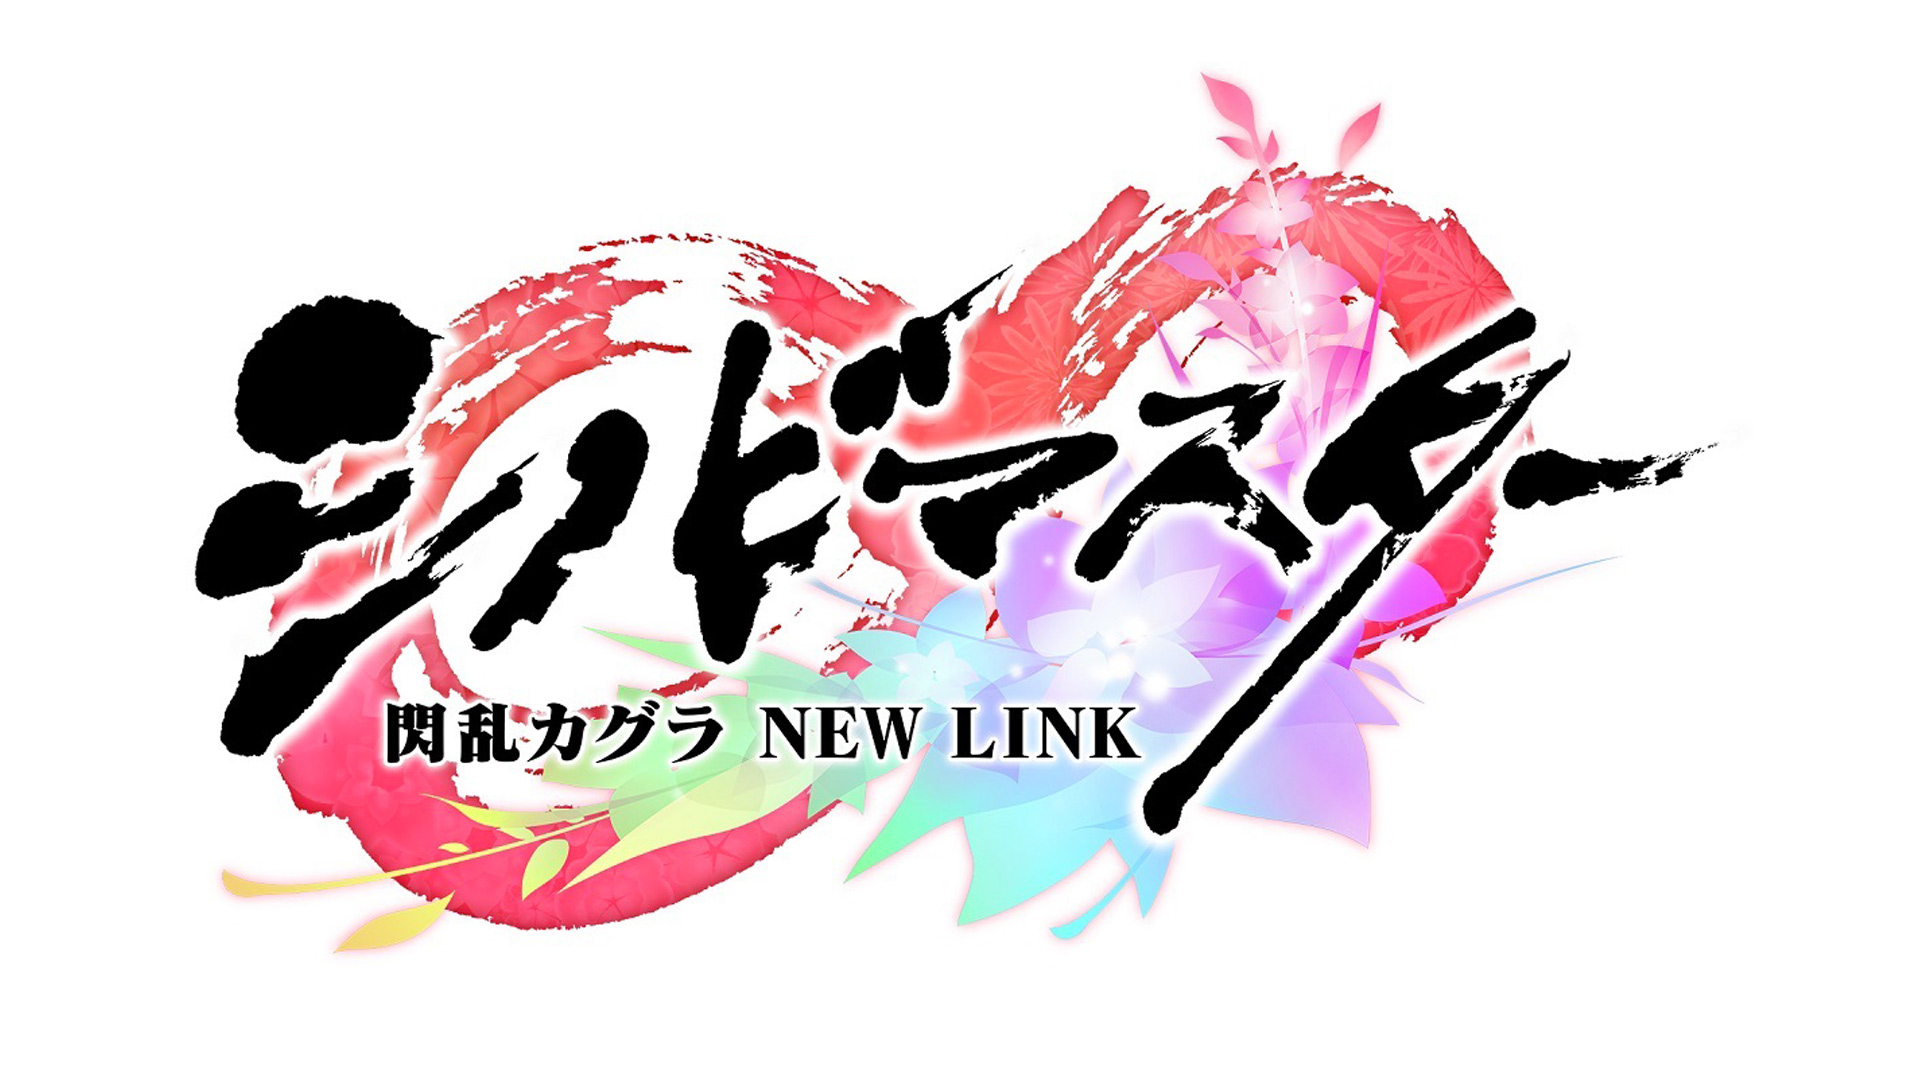 Shinobi Master SENRAN KAGURA: Nuevo enlace